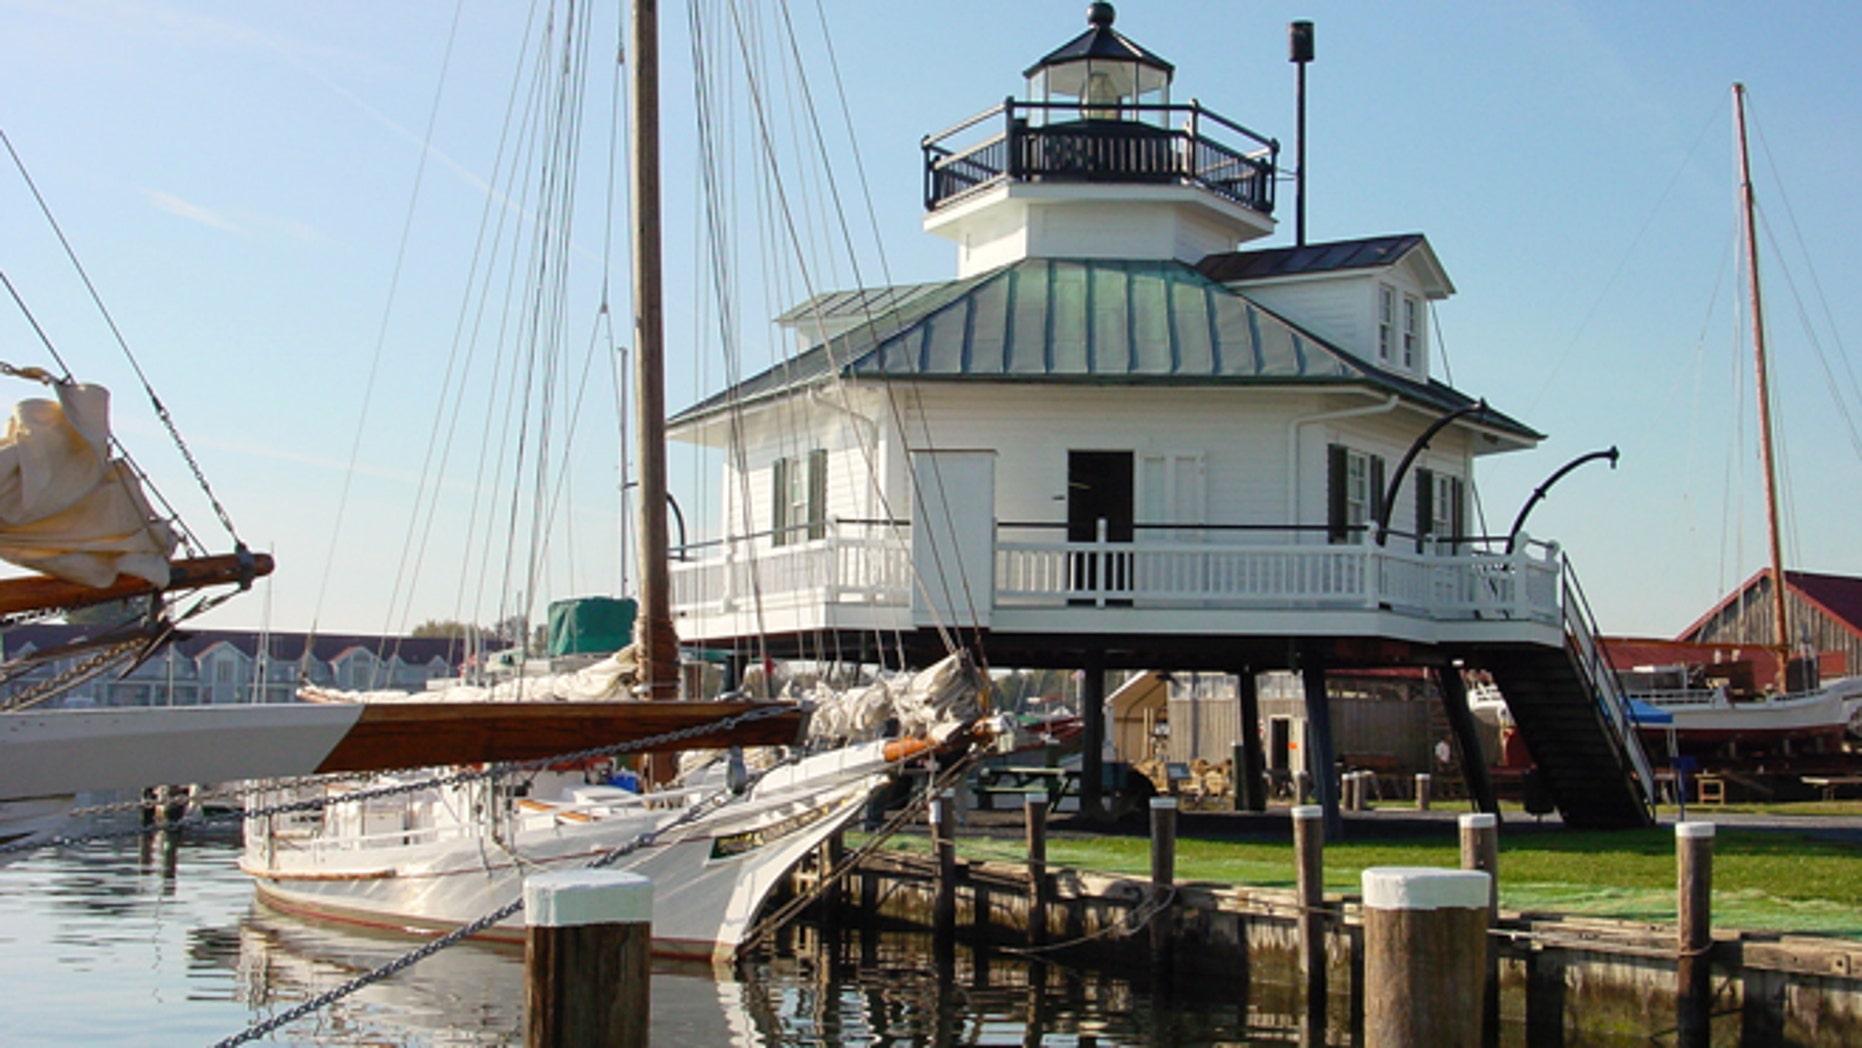 Hooper Strait Lighthouse and skipjack Nathan of Dorchester.